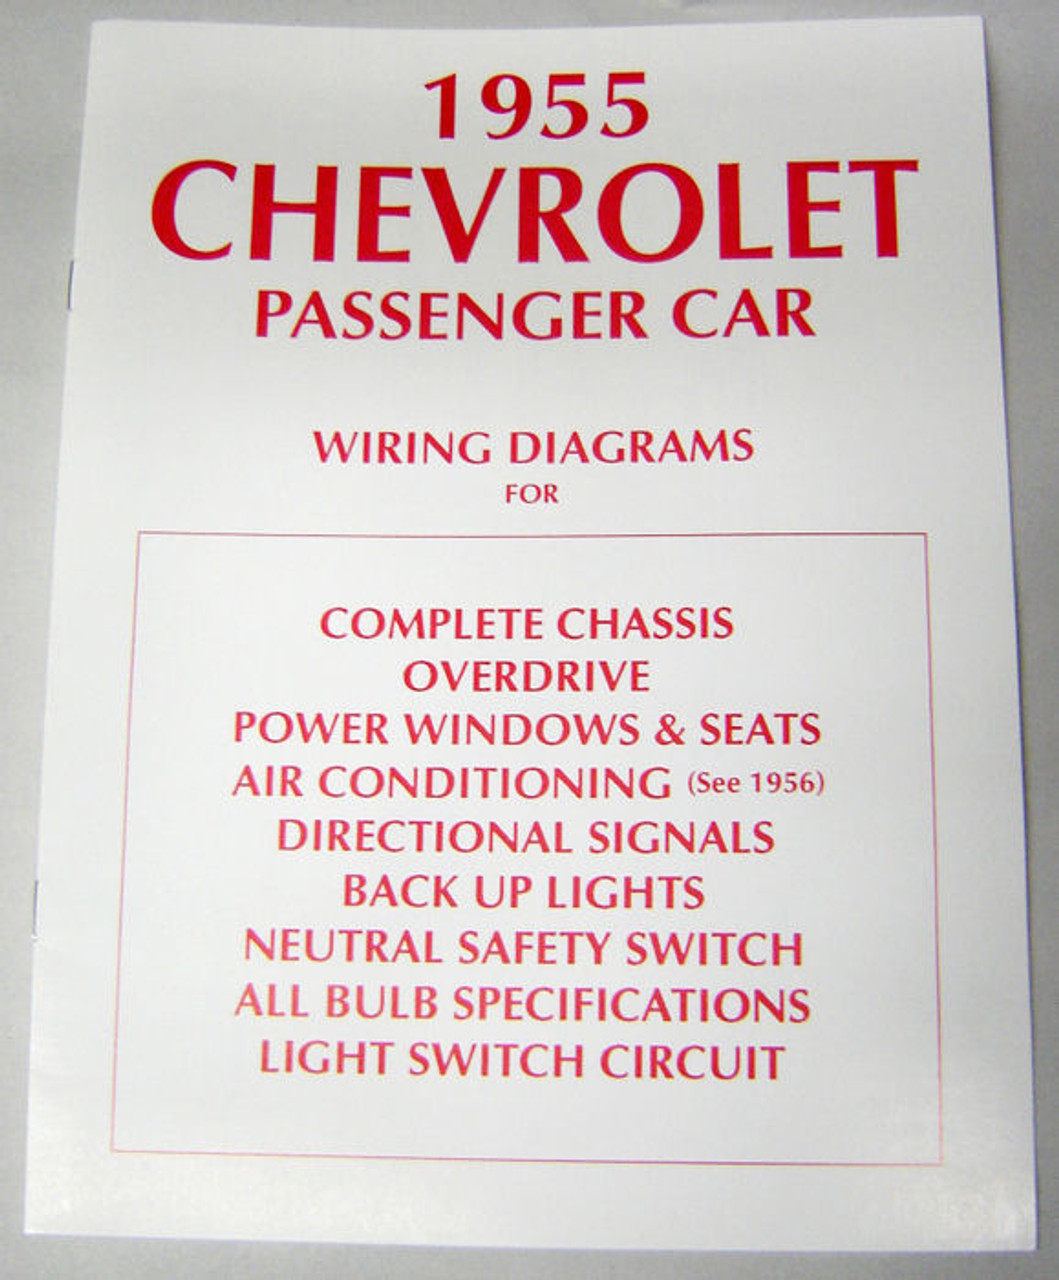 L1000_zpsbamkugxp__90195.1443295376?c\=2 56 chevy ignition switch wiring wiring diagrams 1965 chevy ignition switch wiring diagram at honlapkeszites.co